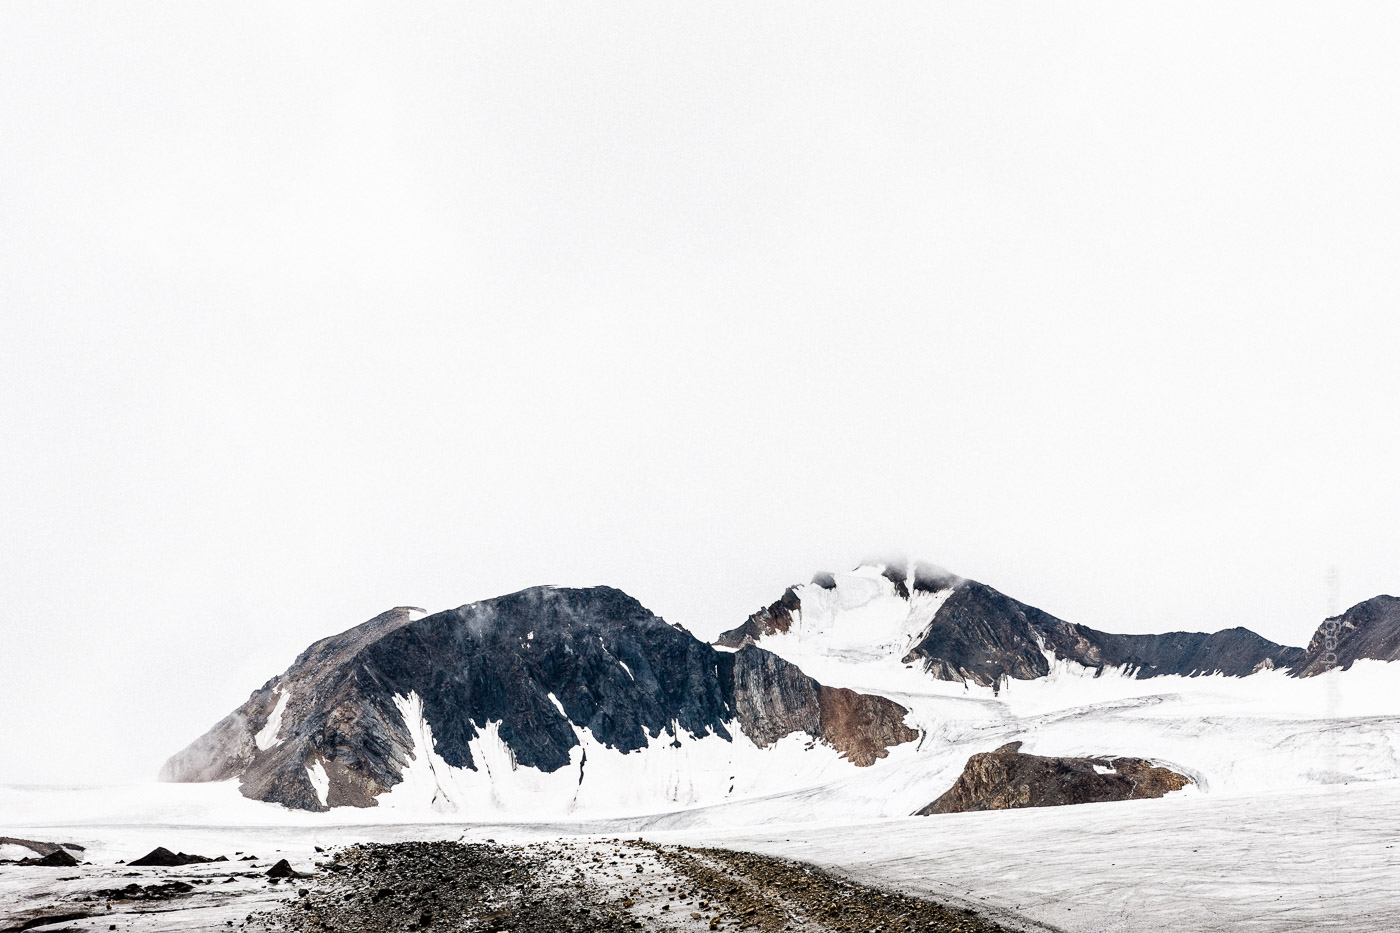 01_land_of_ice_alexanderlembke_de